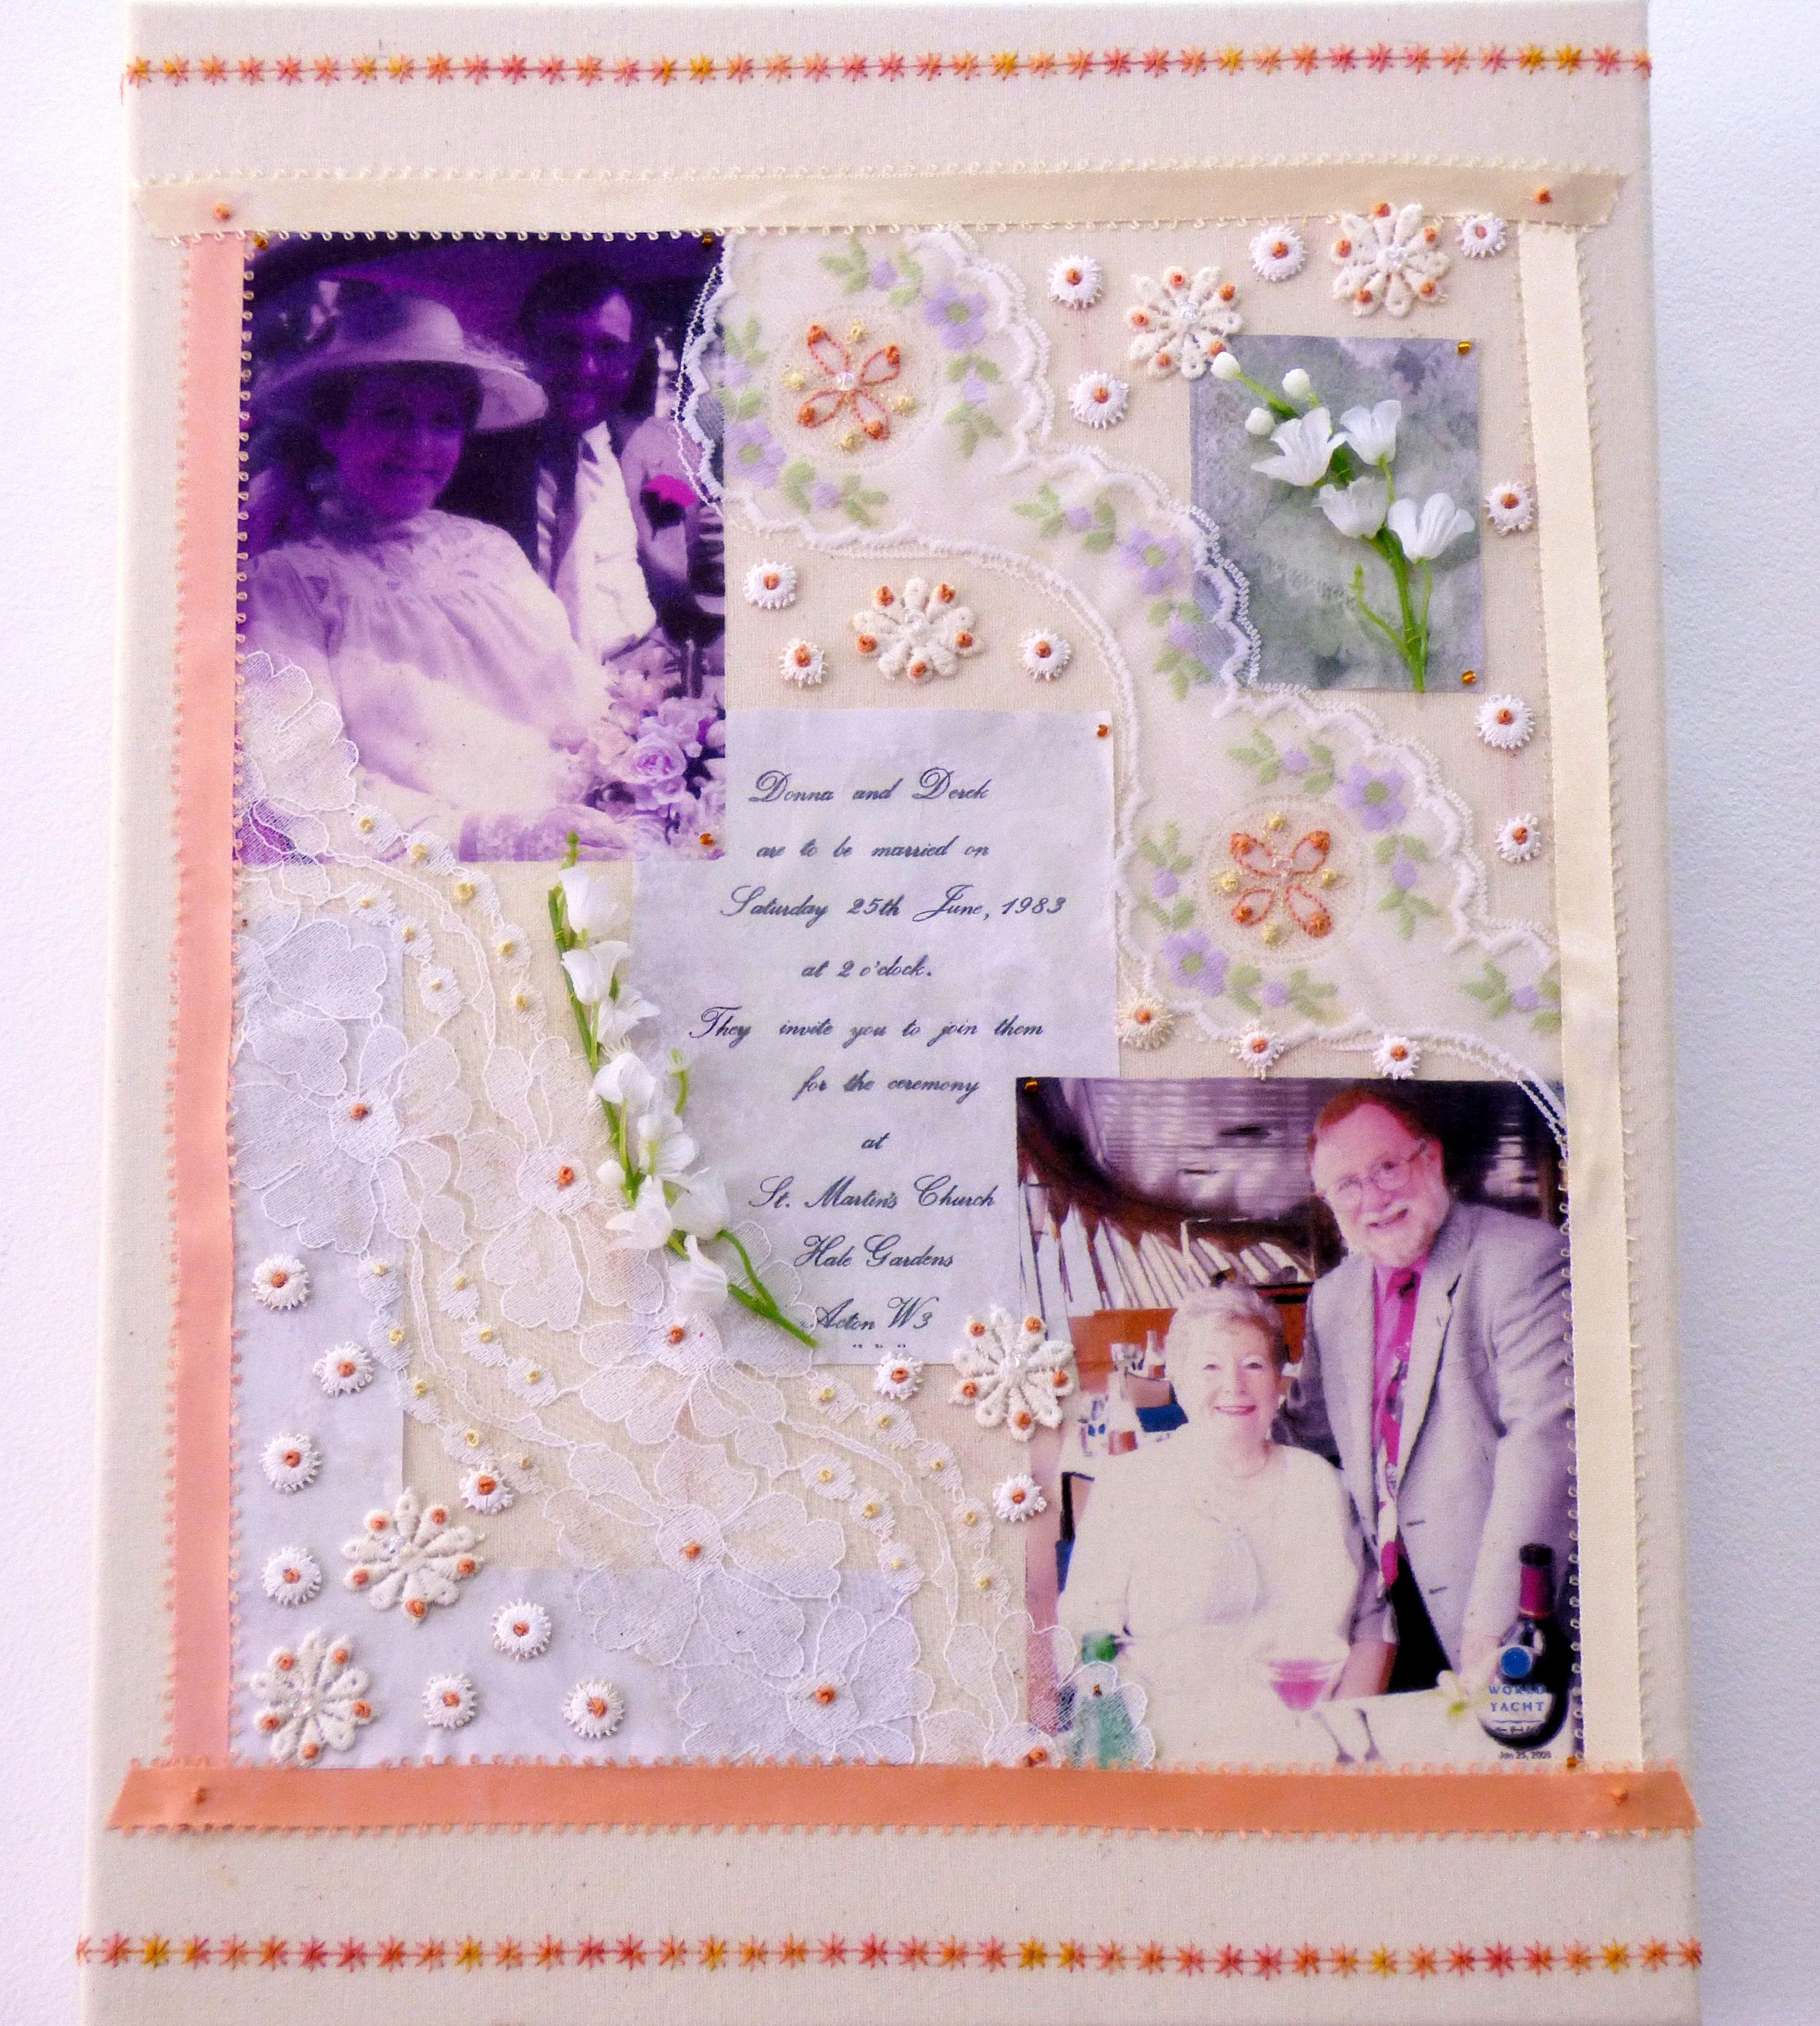 WEDDING MEMORIES by Donna Eaton, Parbold EG